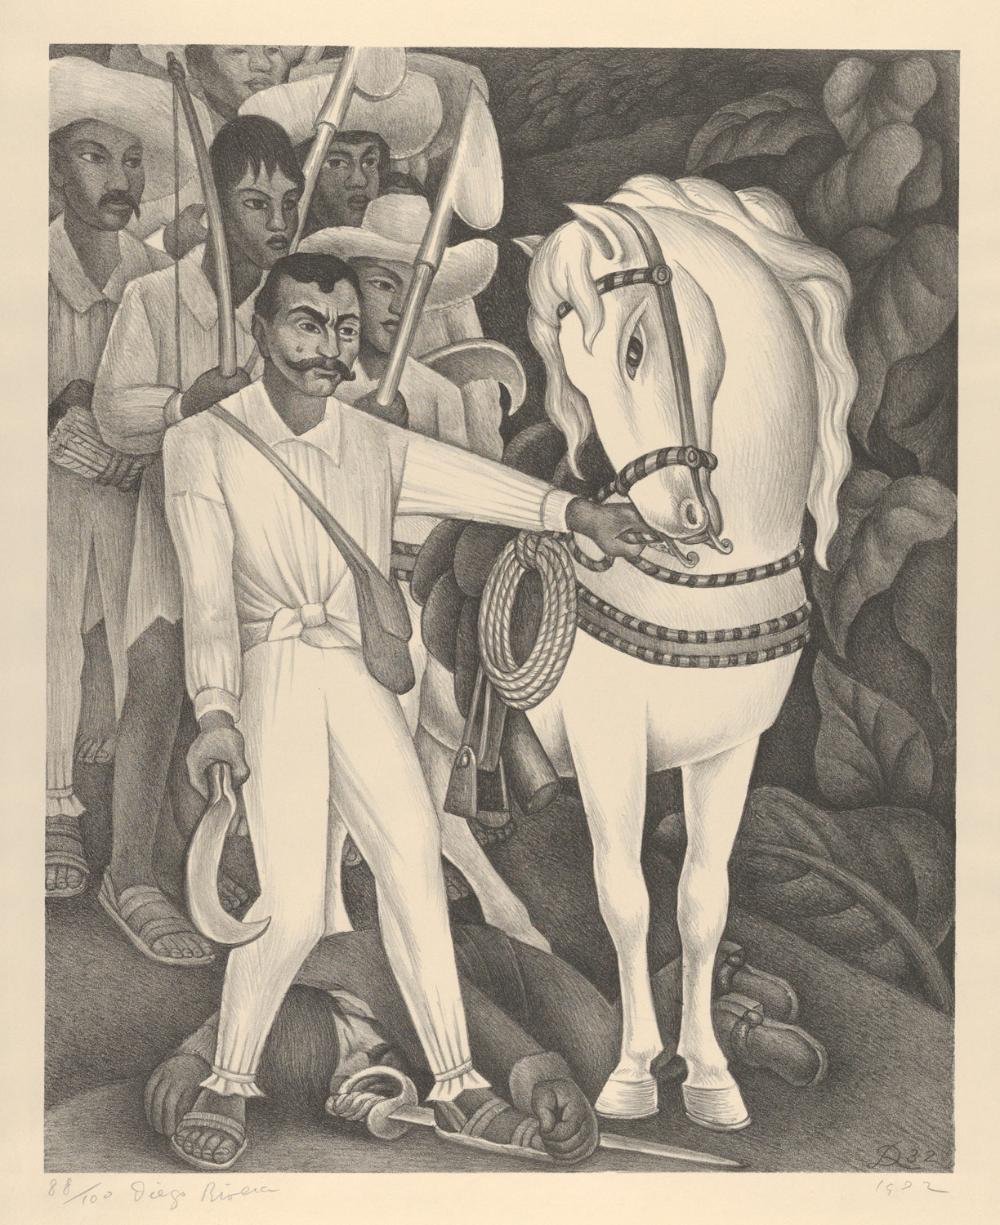 Diego Rivera Emiliano Zapata And His Horse The Metropolitan Museum Of Art Diego Rivera Art Latino Art